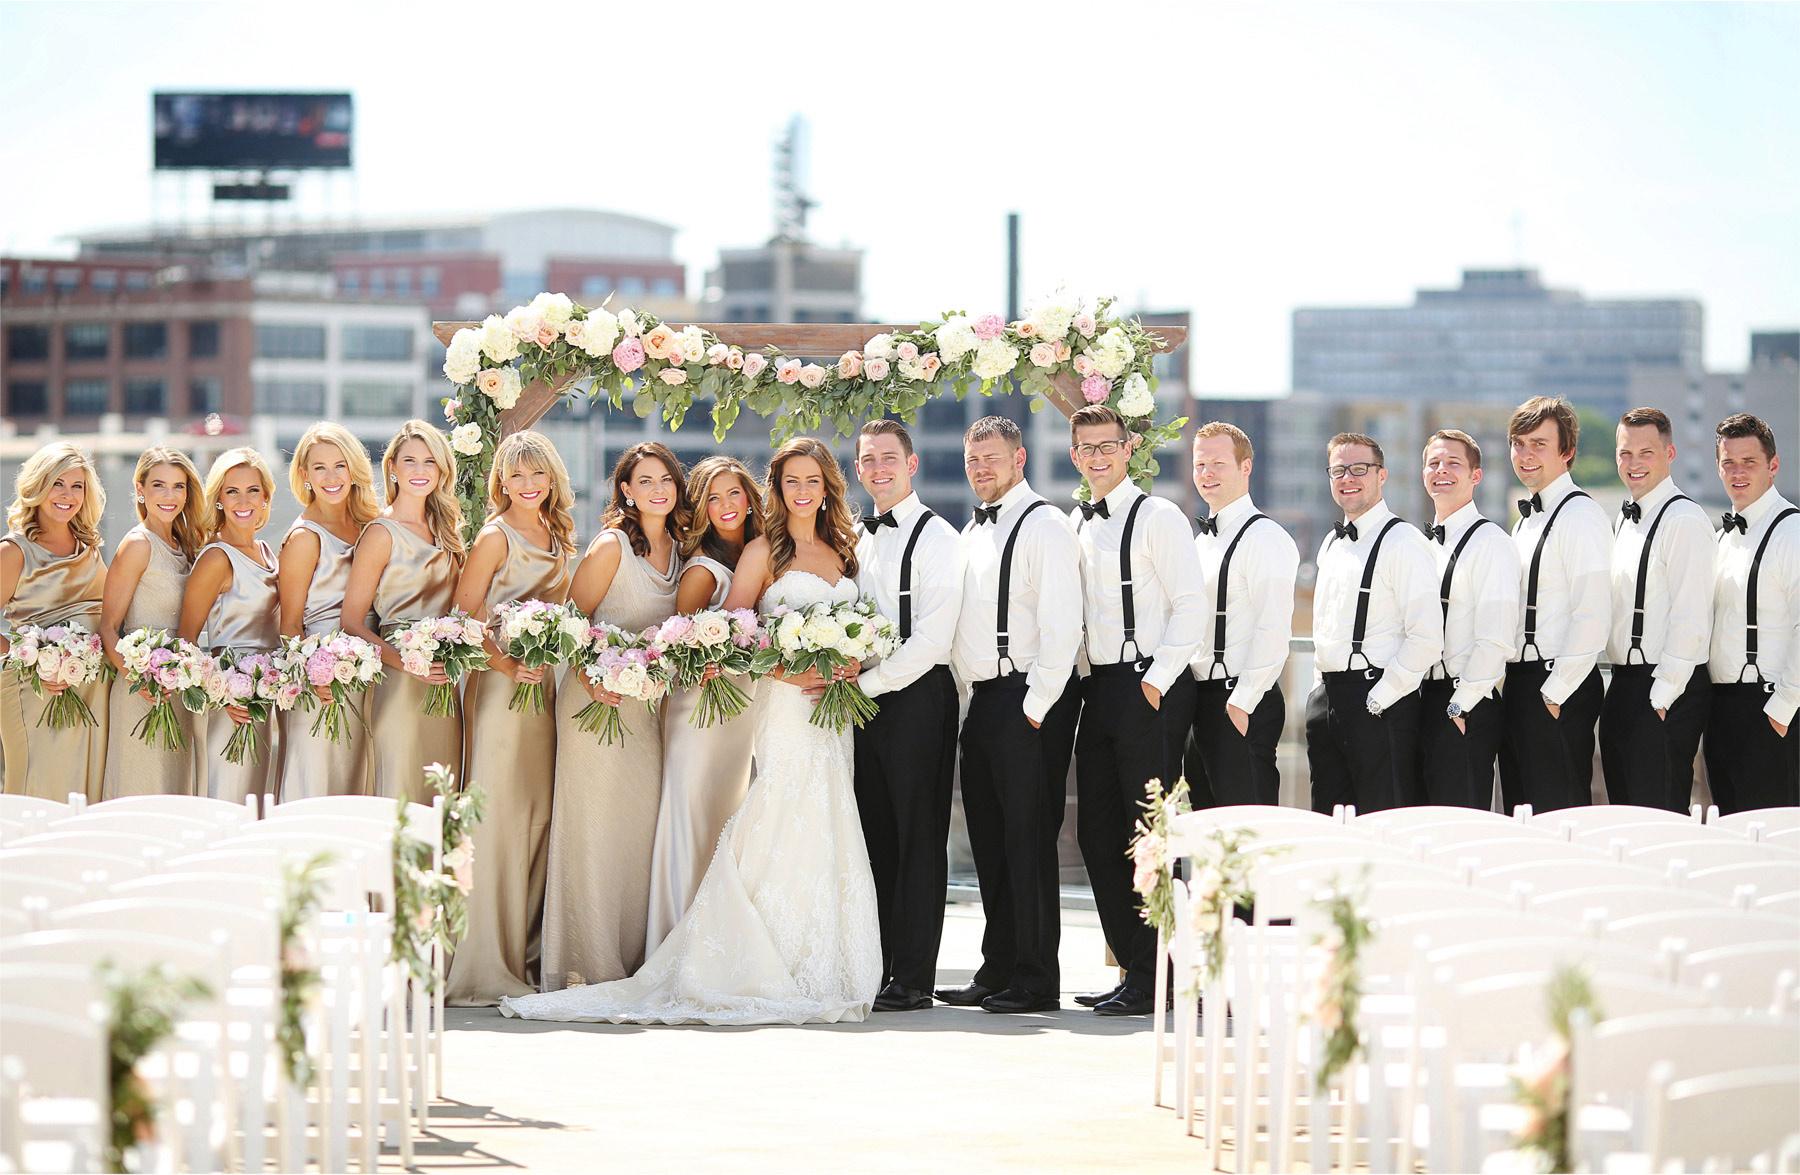 12-Saint-Paul-Minnesota-Wedding-Photographer-by-Andrew-Vick-Photography-Summer-Bride-Groom-Groomsmen-Bridesmaids-Bridal-Party-Flowers-Molly-and-Dan.jpg